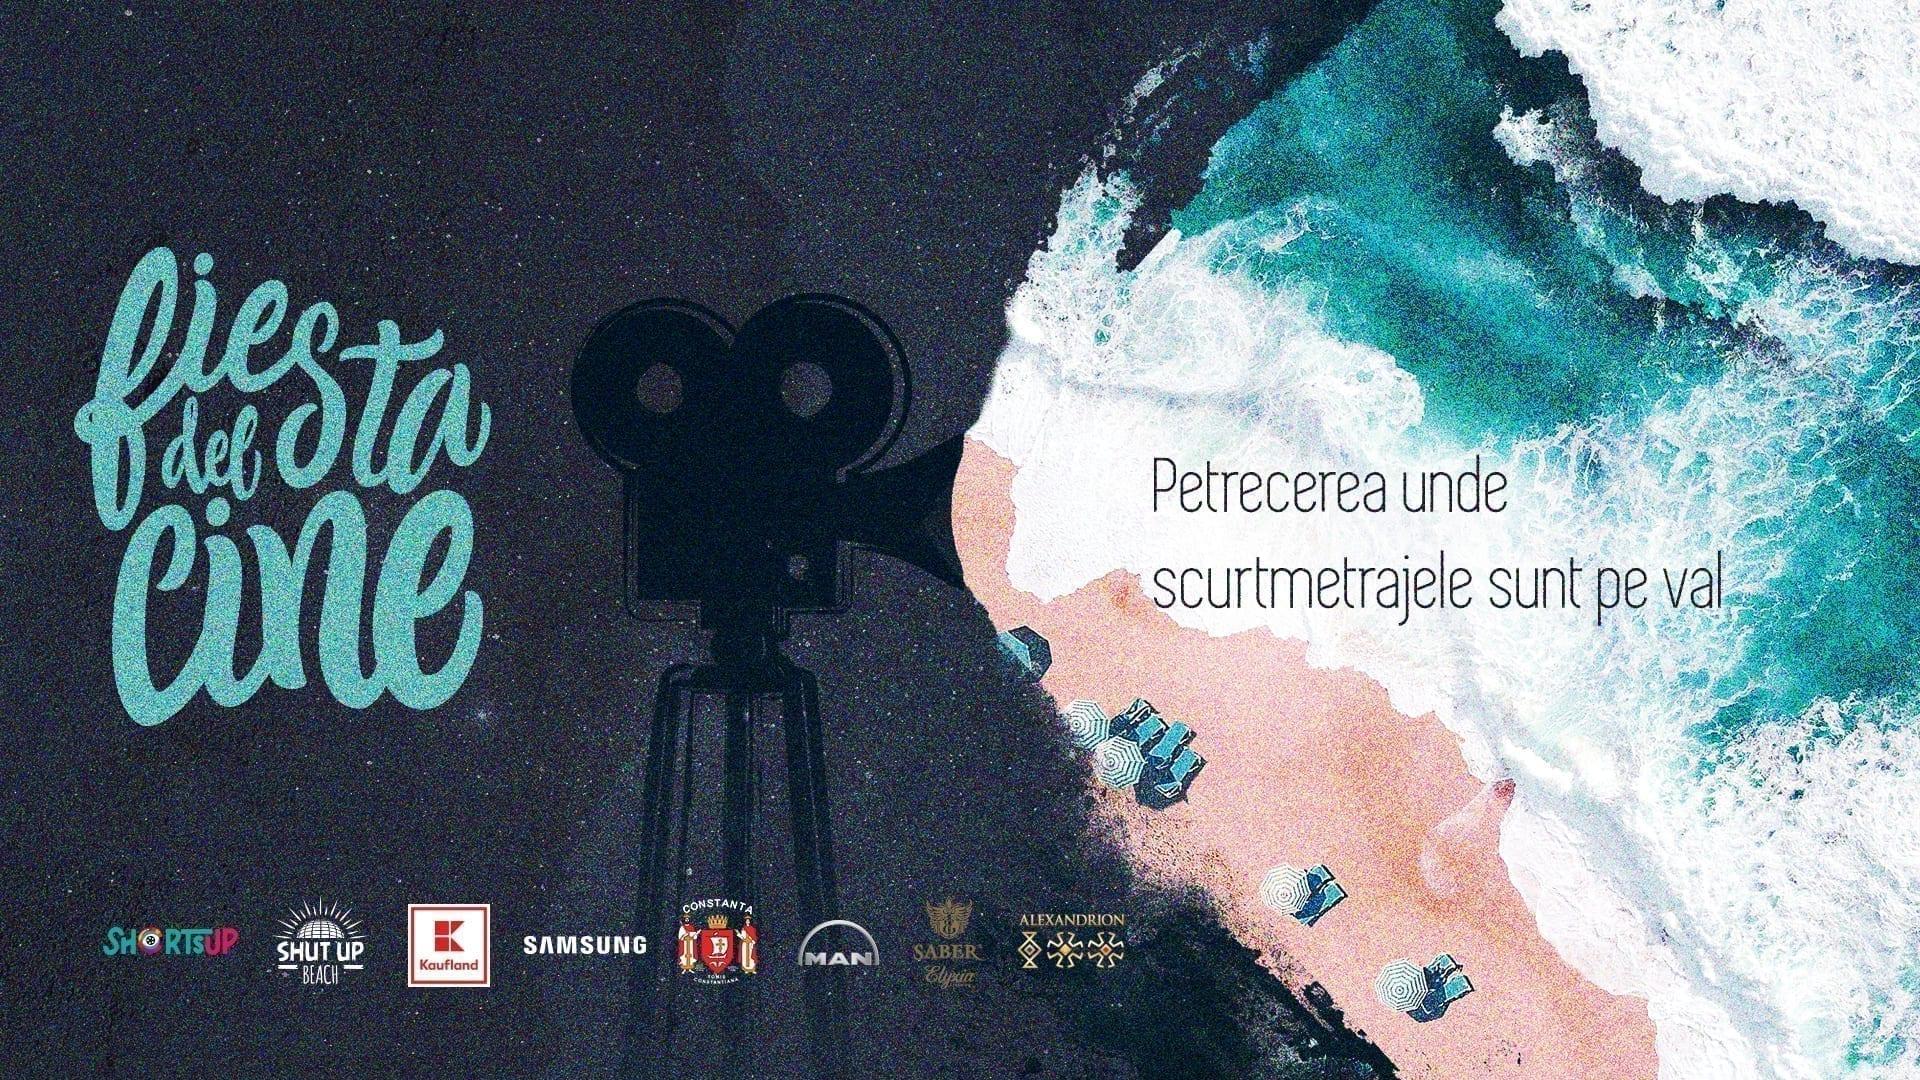 Fiesta del Cine | Ediția #2